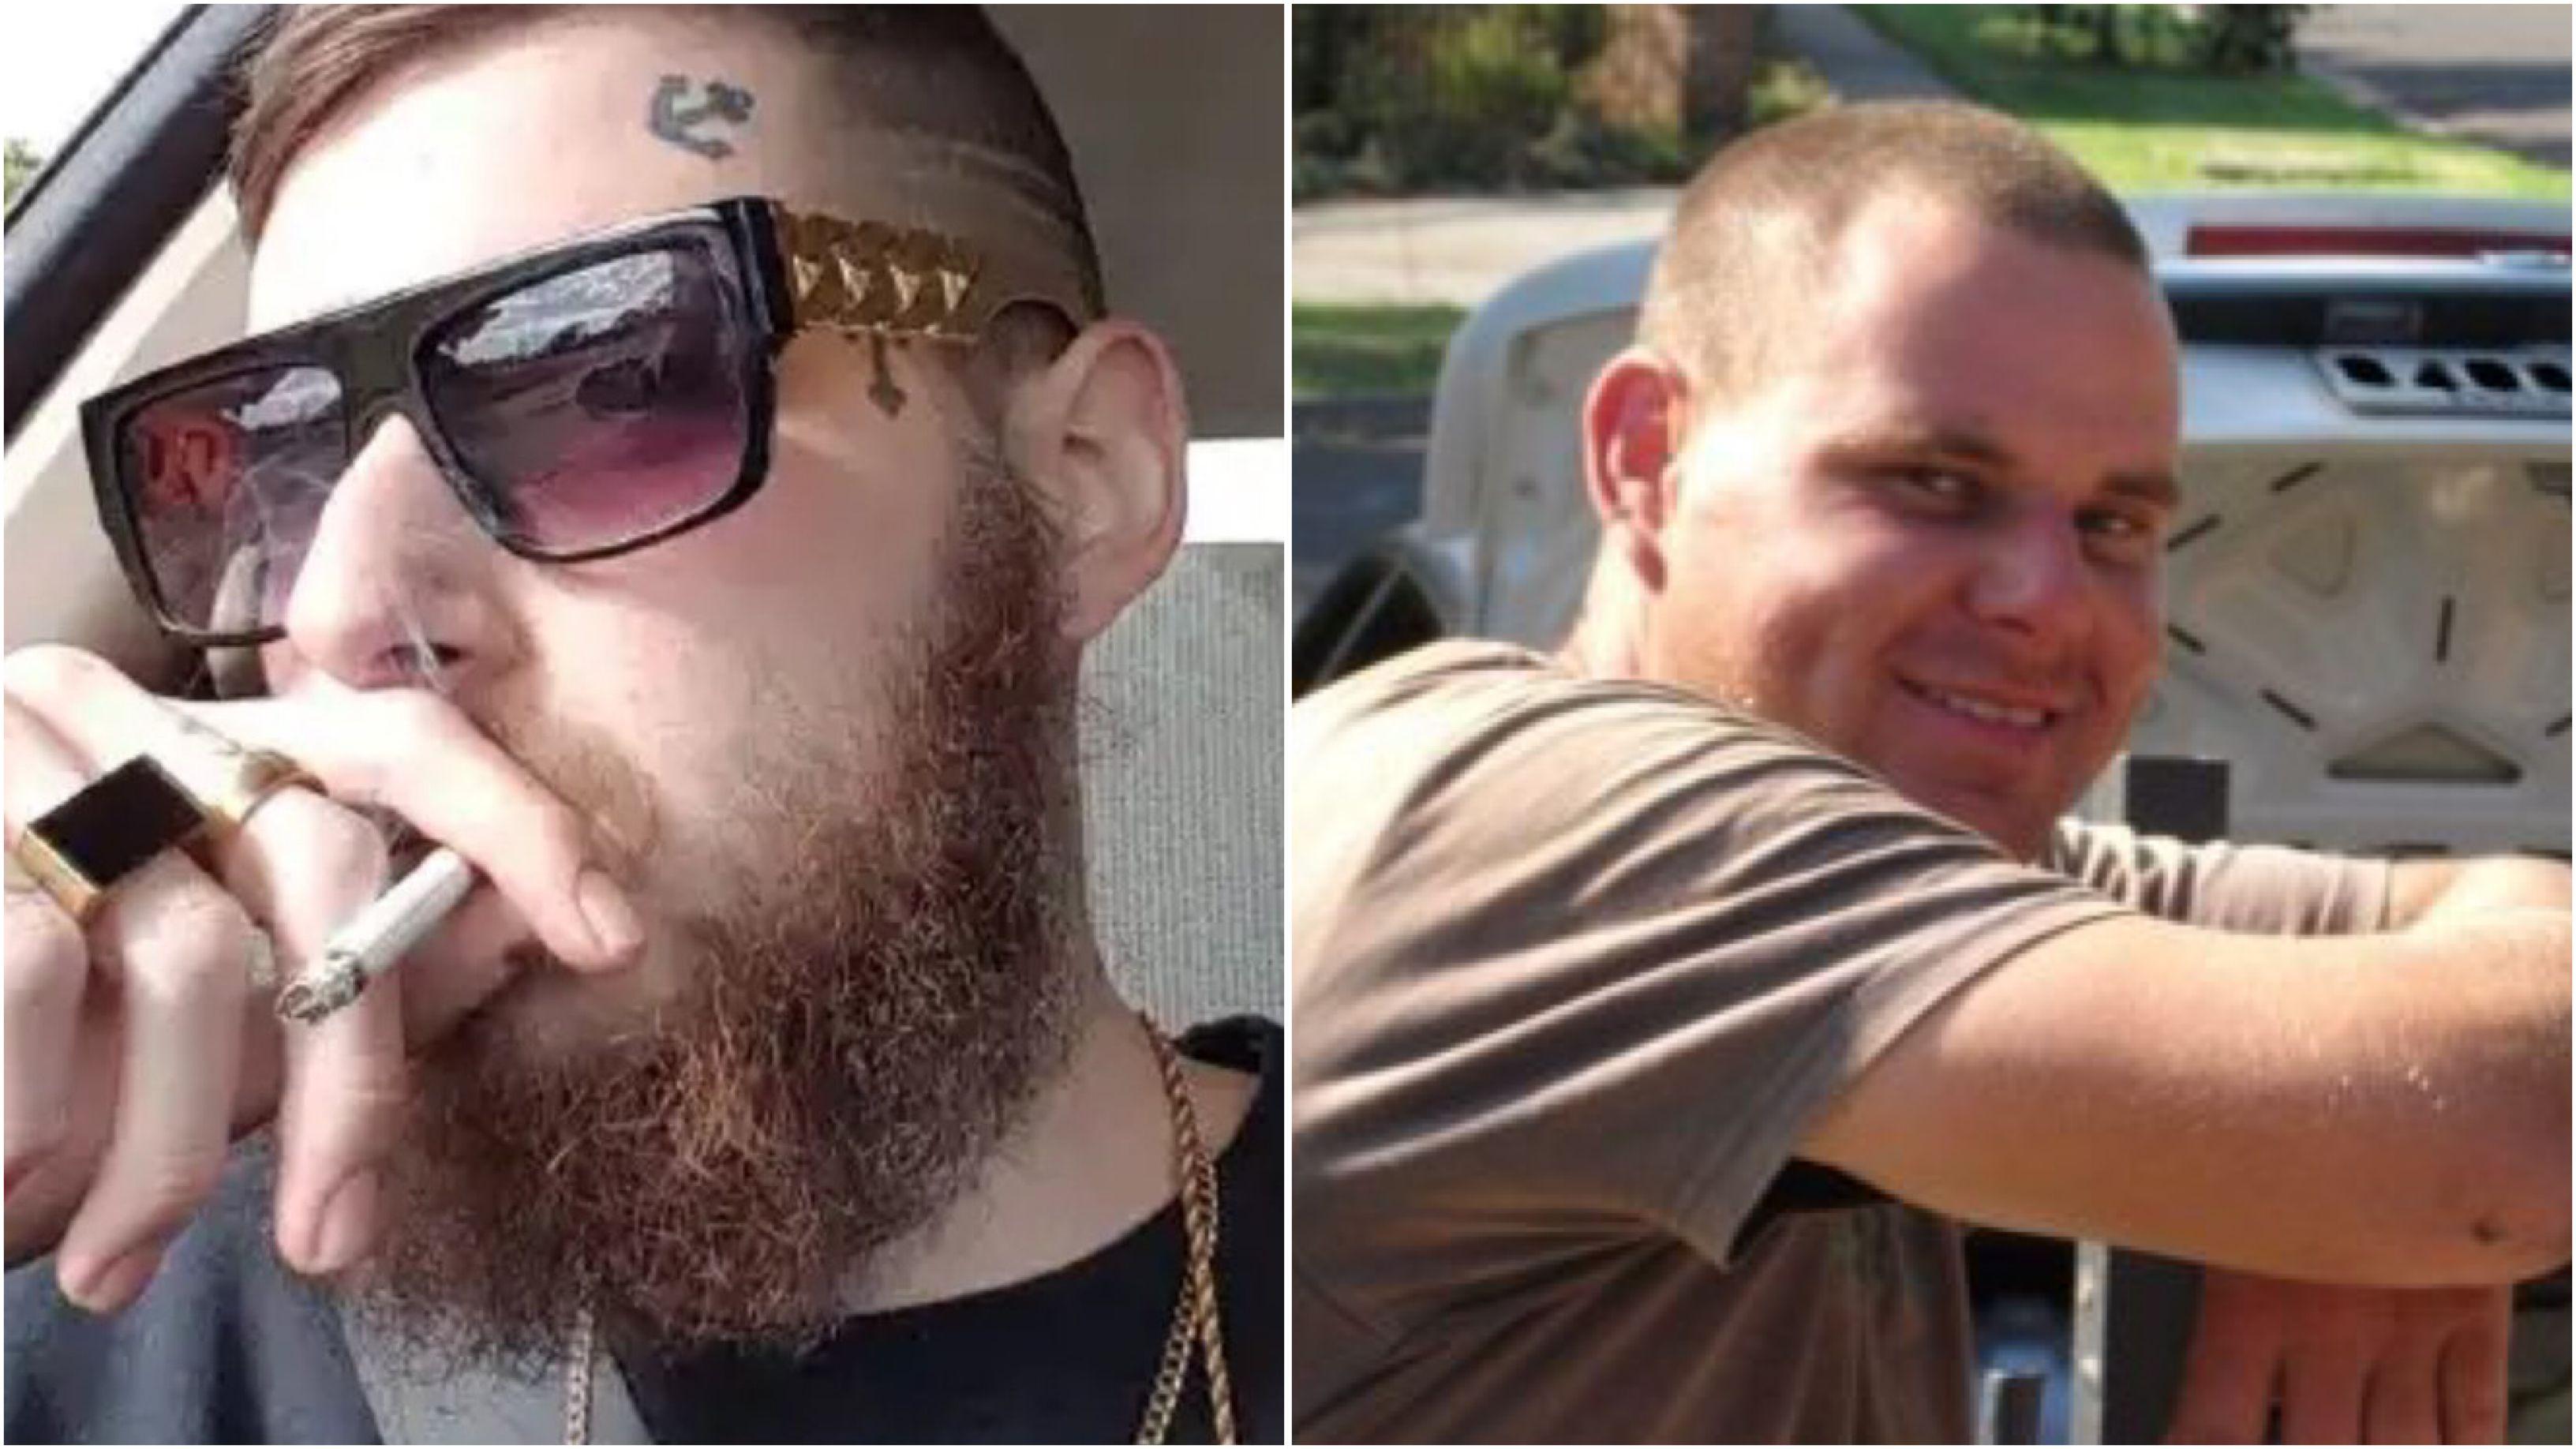 Adelaide road rage killer sentenced over stabbing attack